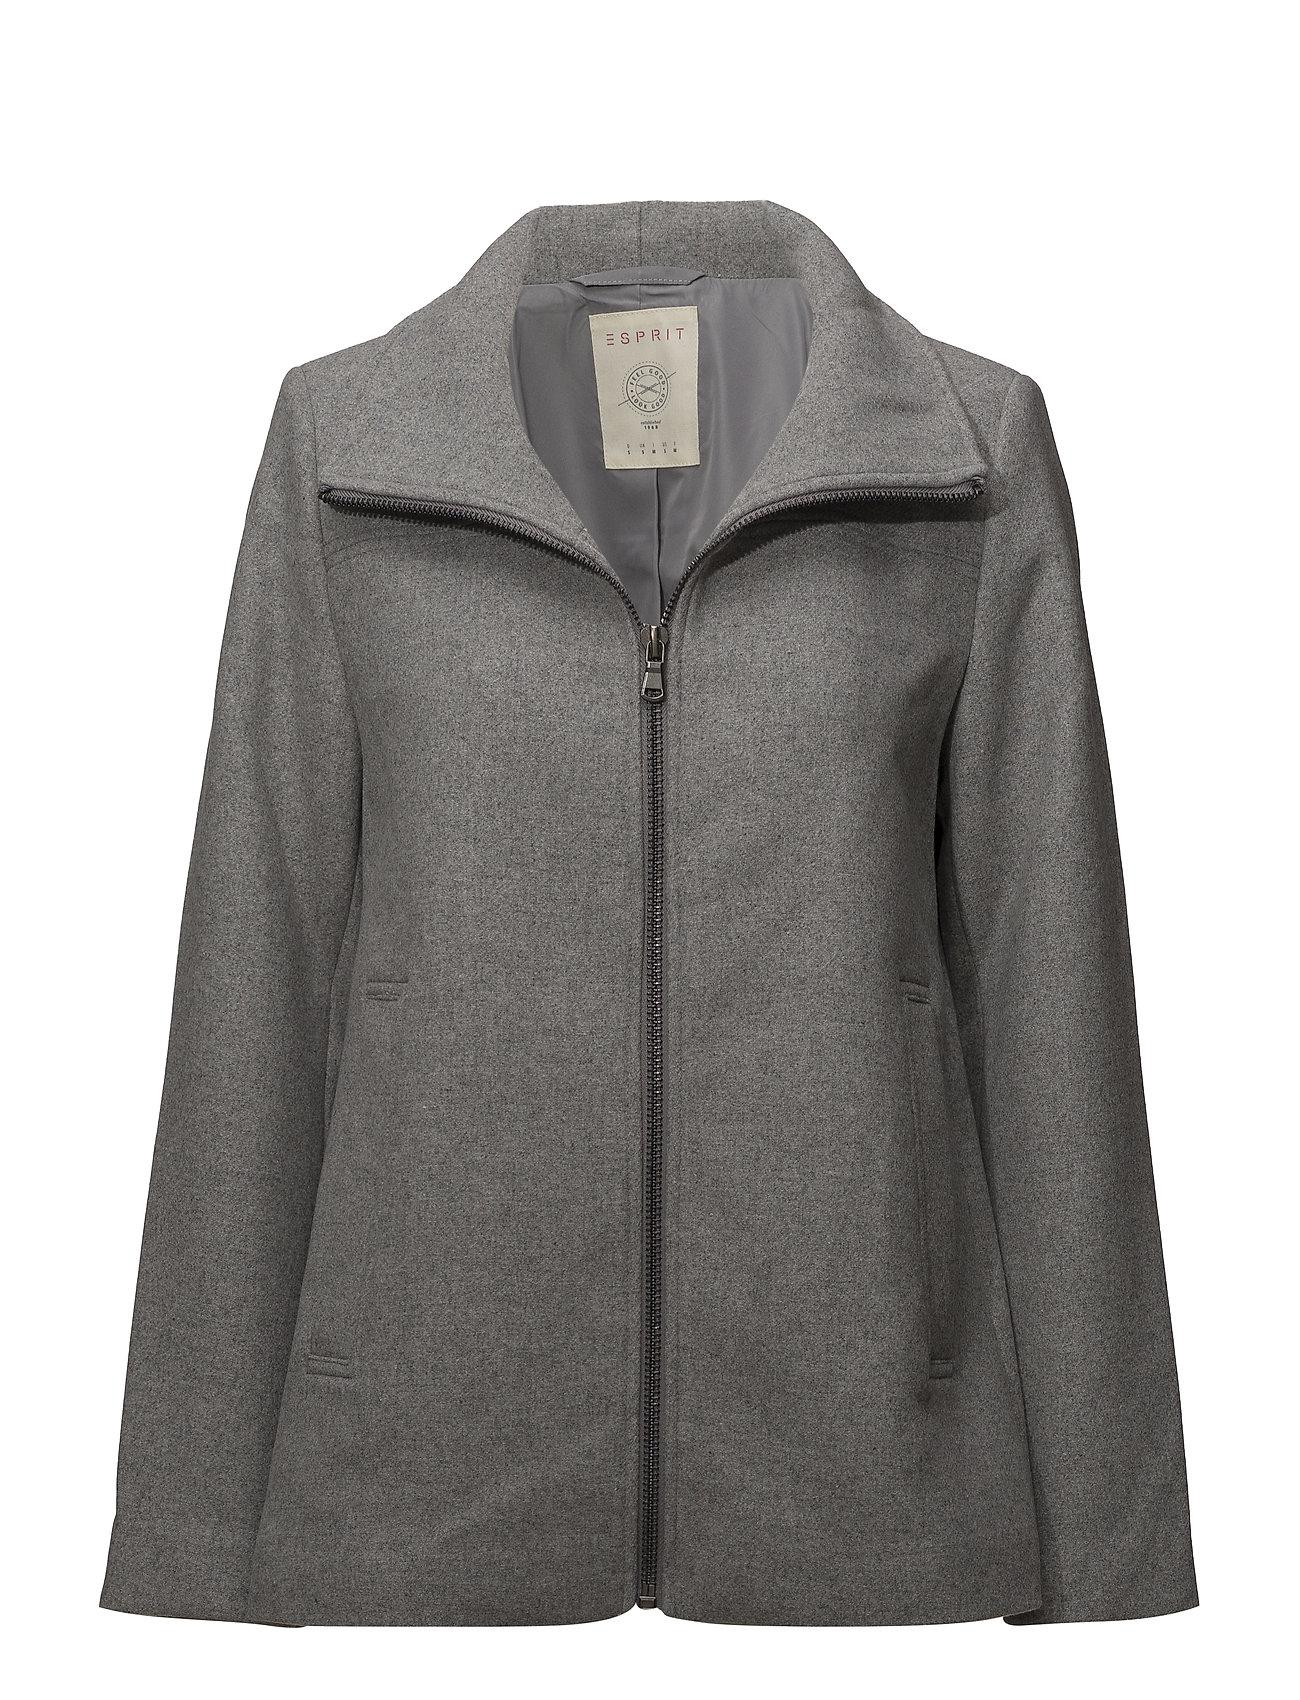 Esprit Casual Jackets outdoor woven - LIGHT GREY 5